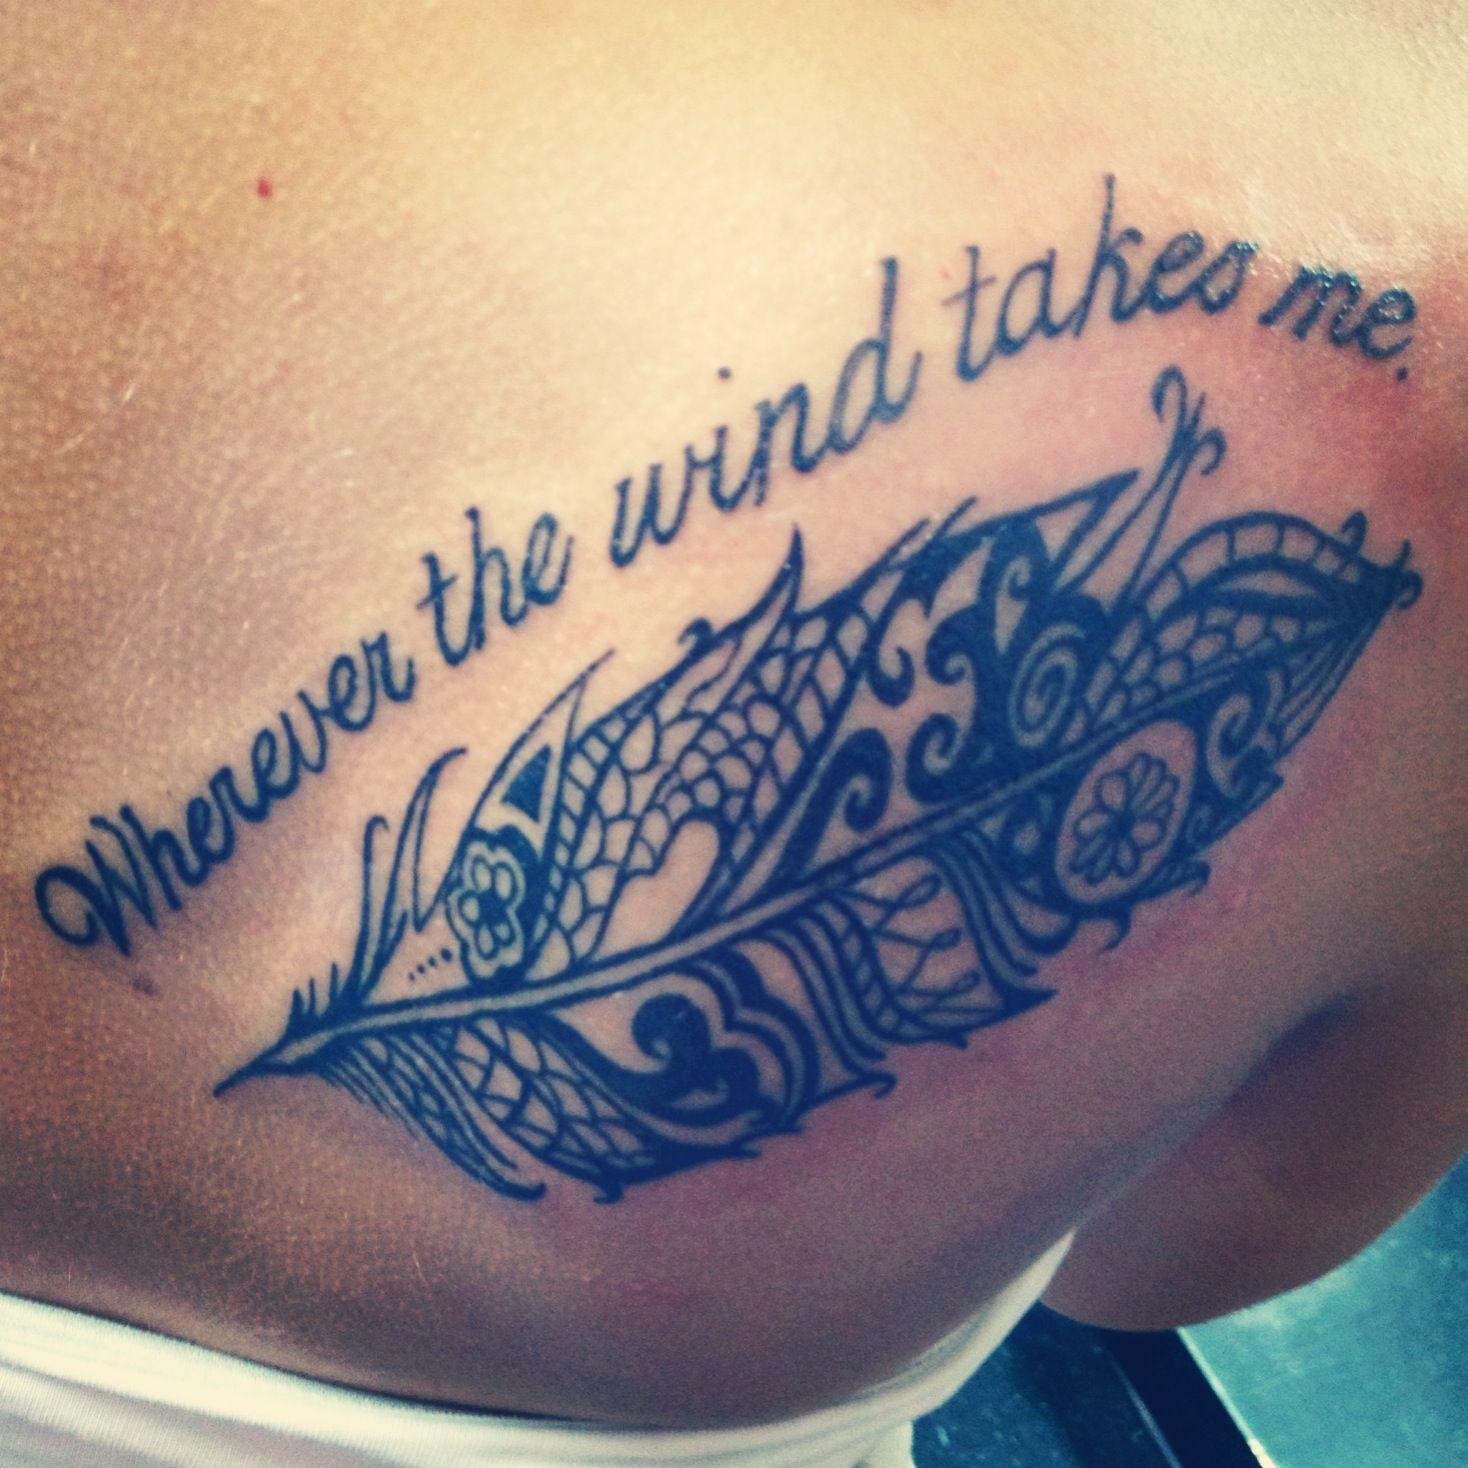 Wherever The Wind Takes Me Tattoo Tattoos Tattoo Quotes Polynesian Tattoo